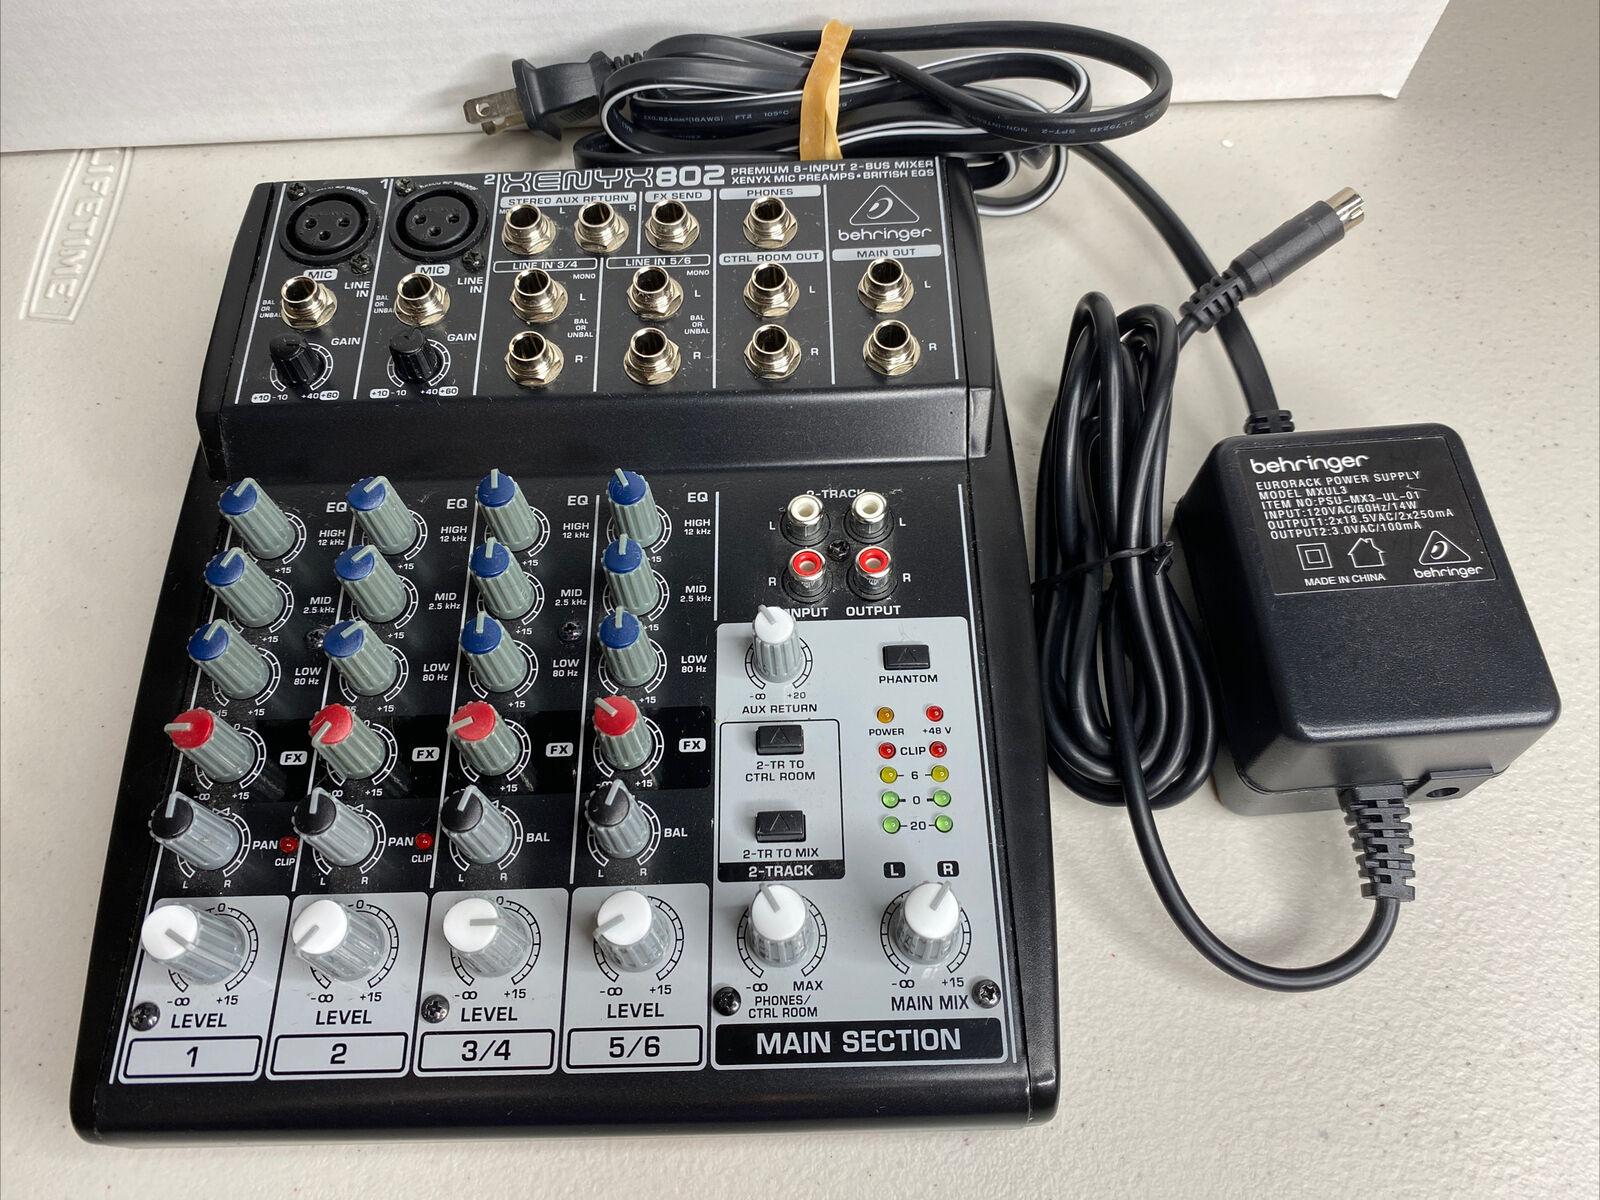 Behringer Xenyx 802 Premium 2-Bus Mixer XENYX802 – DJ Audio Mixing Board. Buy it now for 59.46